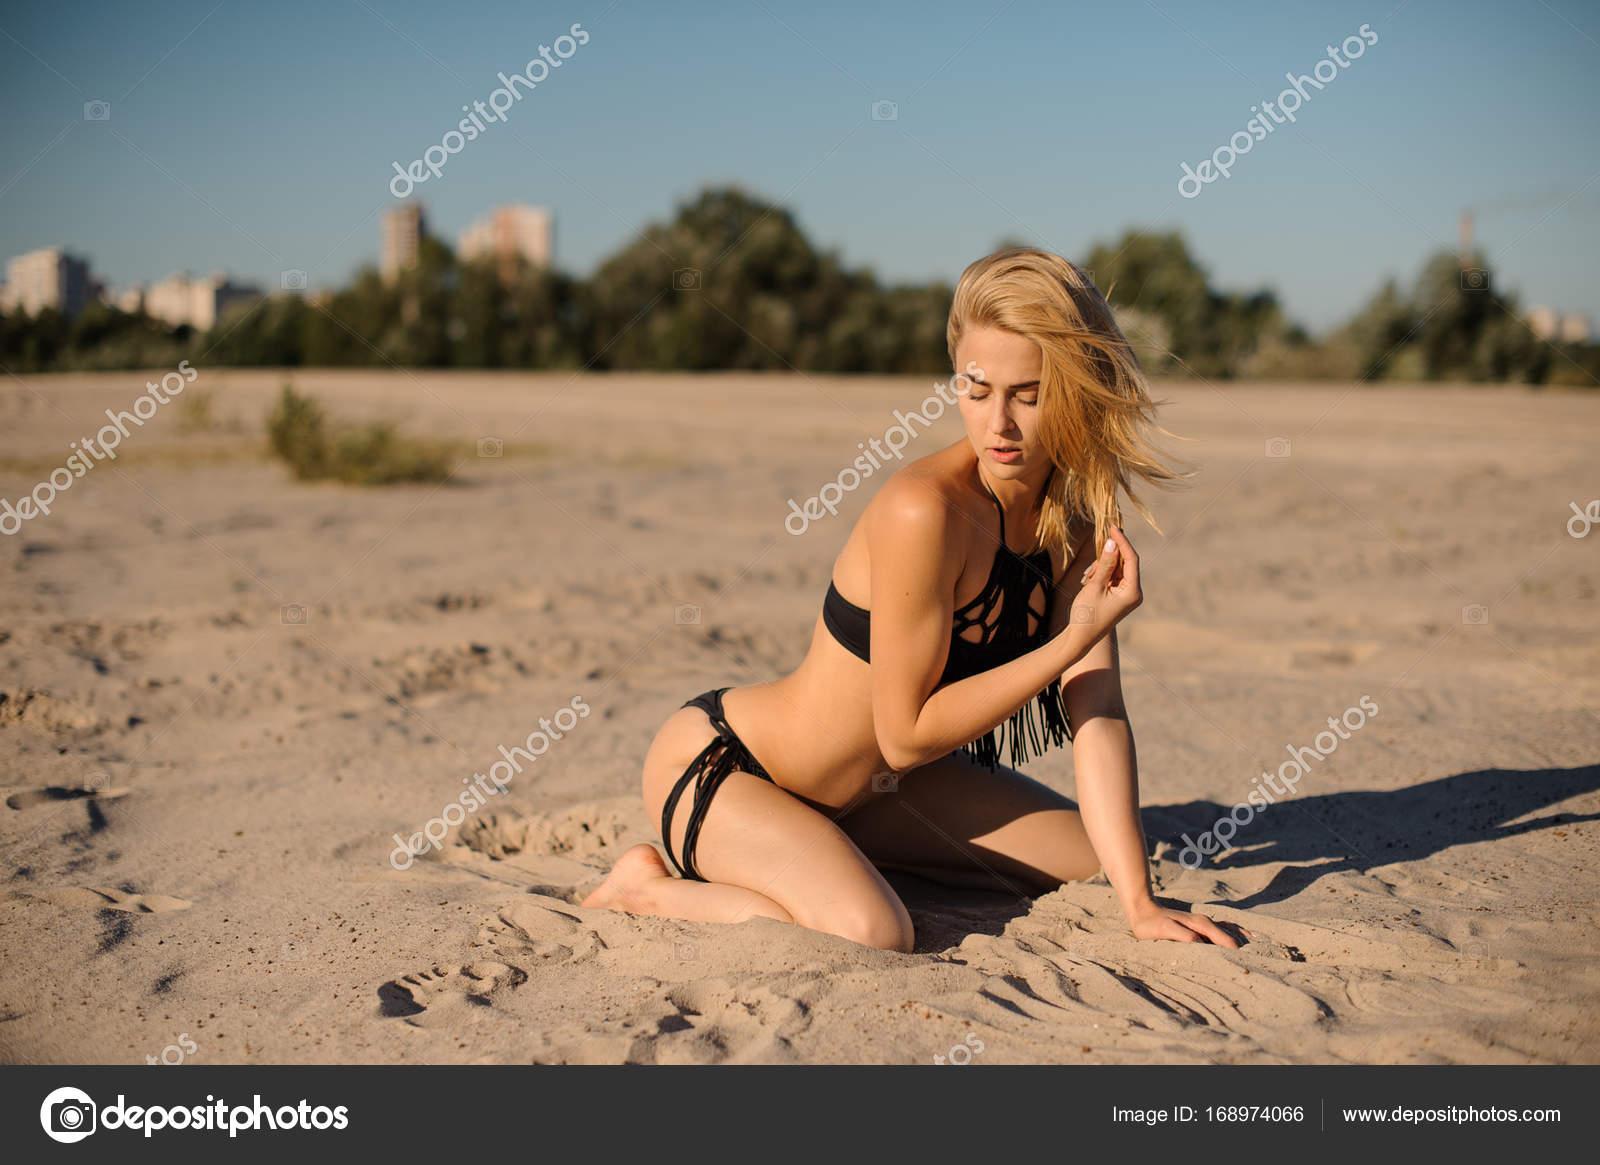 d8d876060d9d Mujer sexy en traje de baño negro sentado en la arena — Fotos de ...